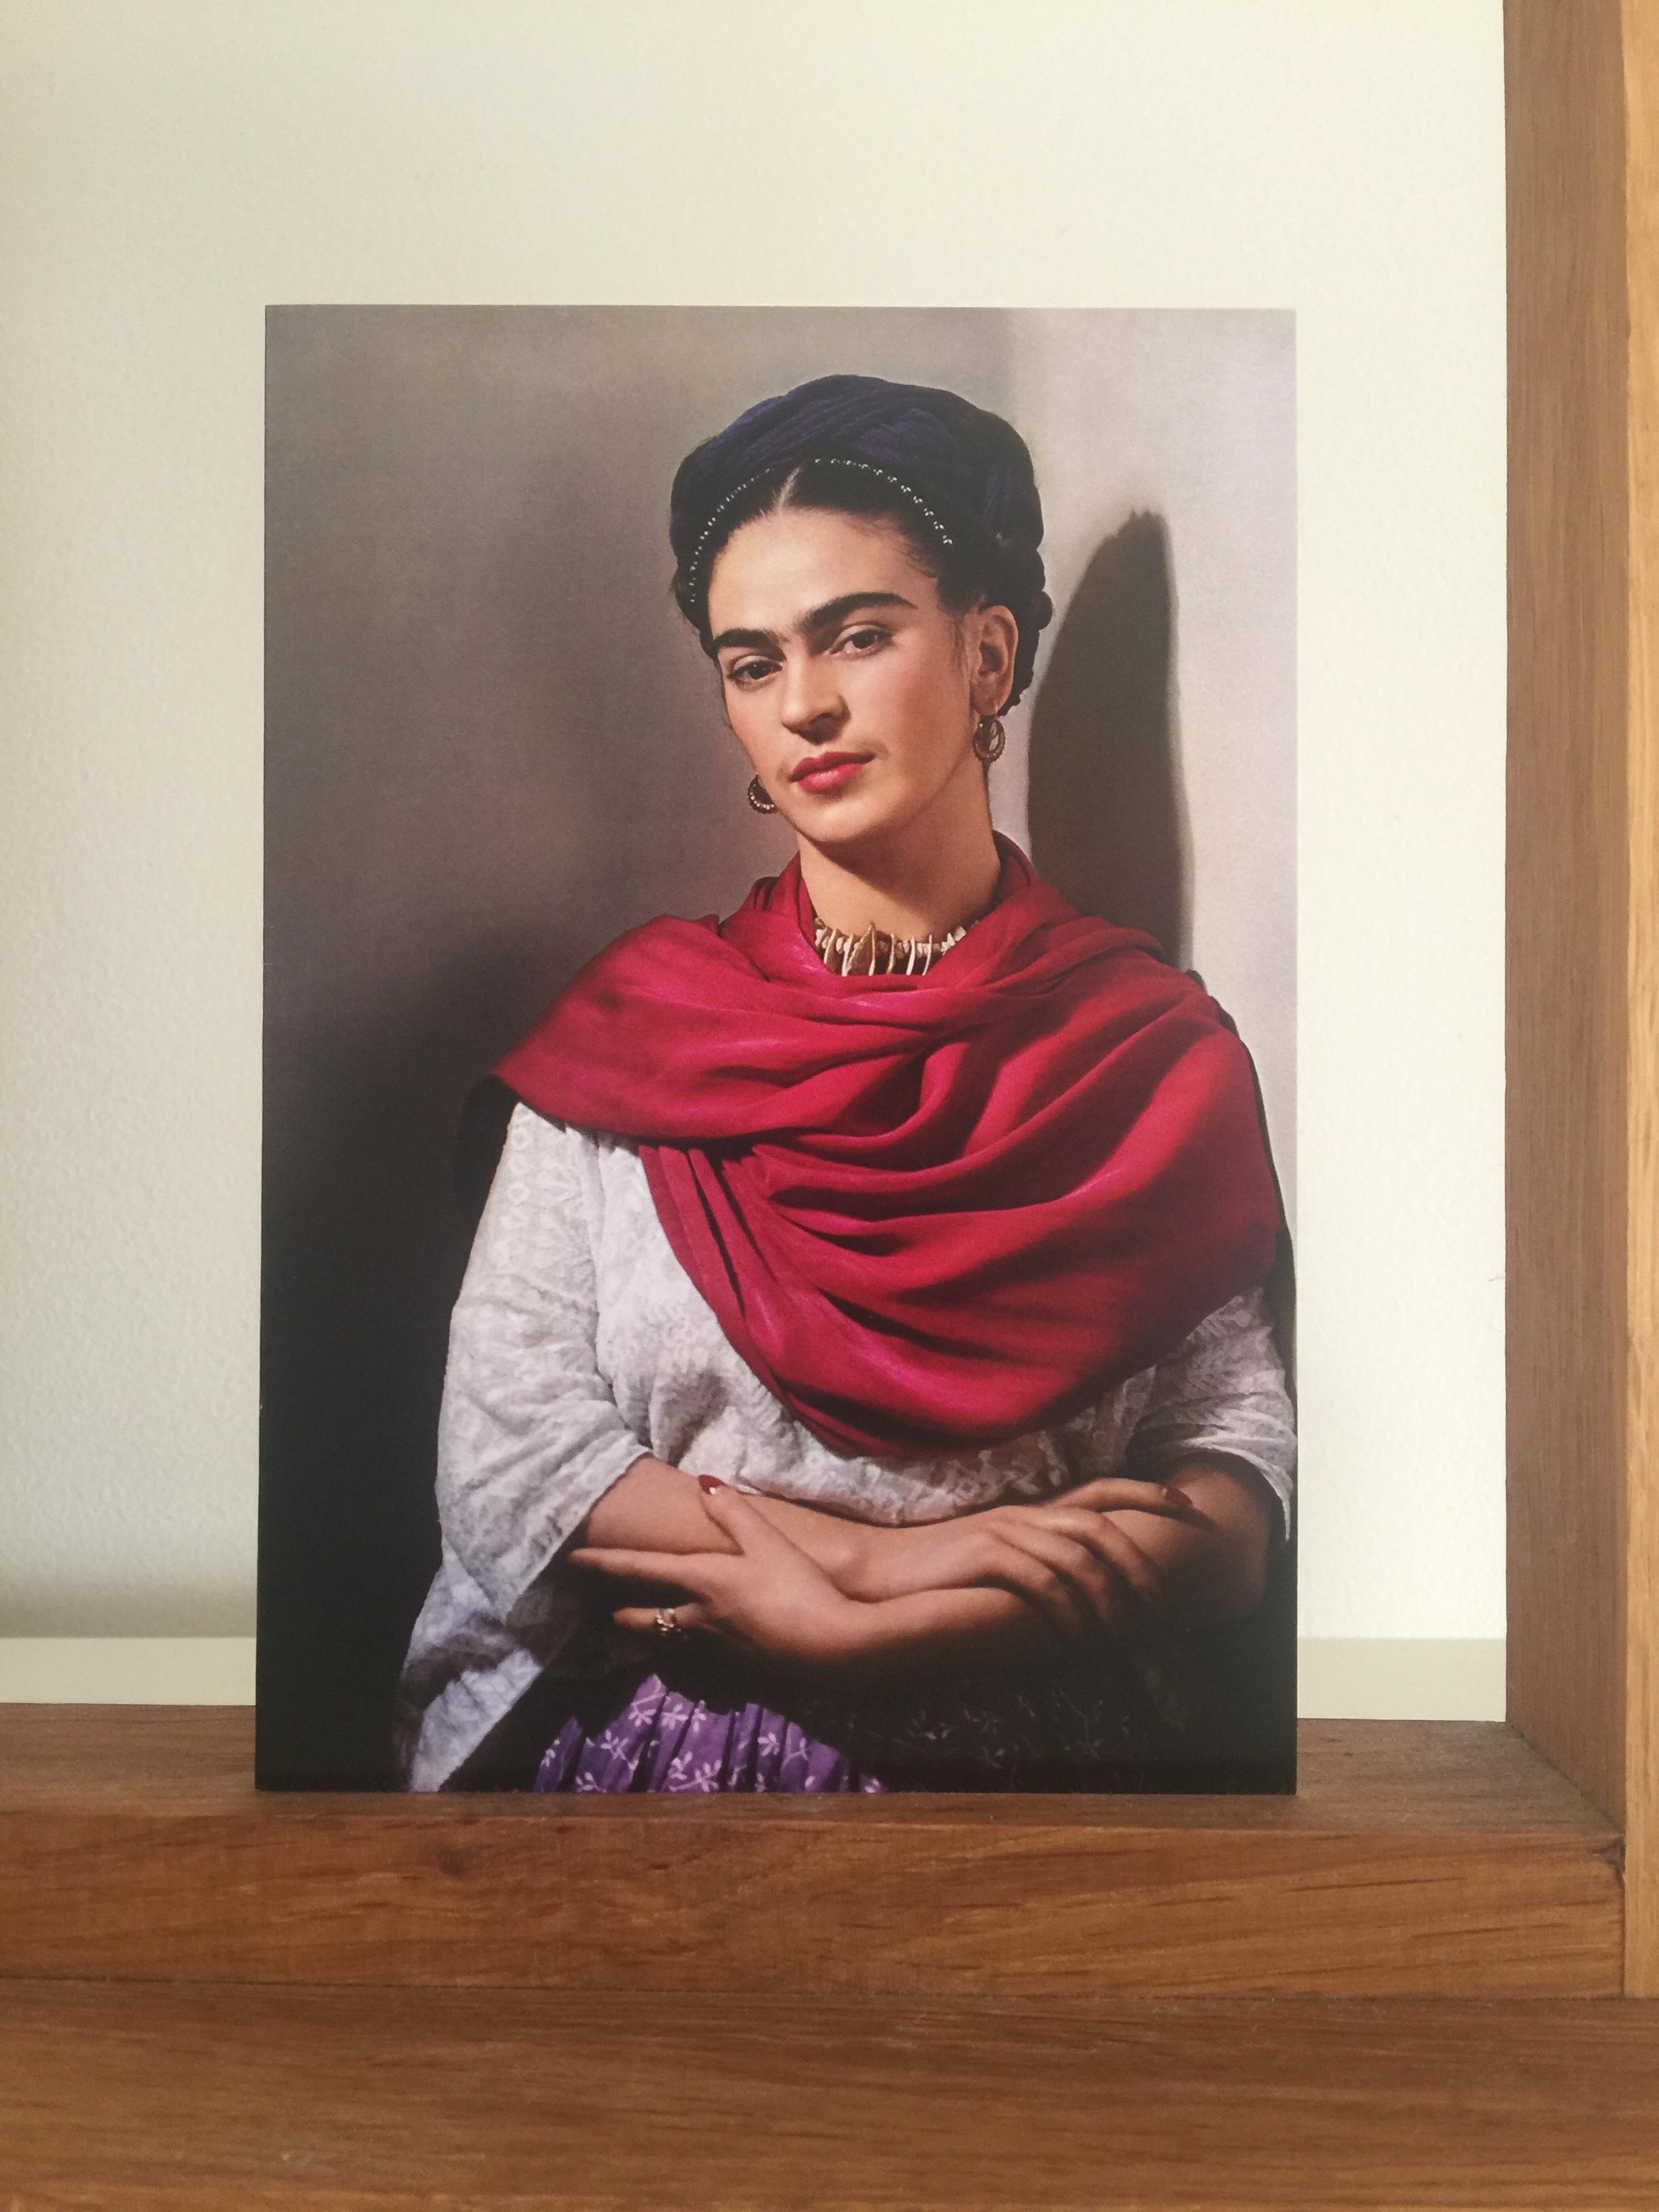 Frida - by Nickolas Murray, wow!